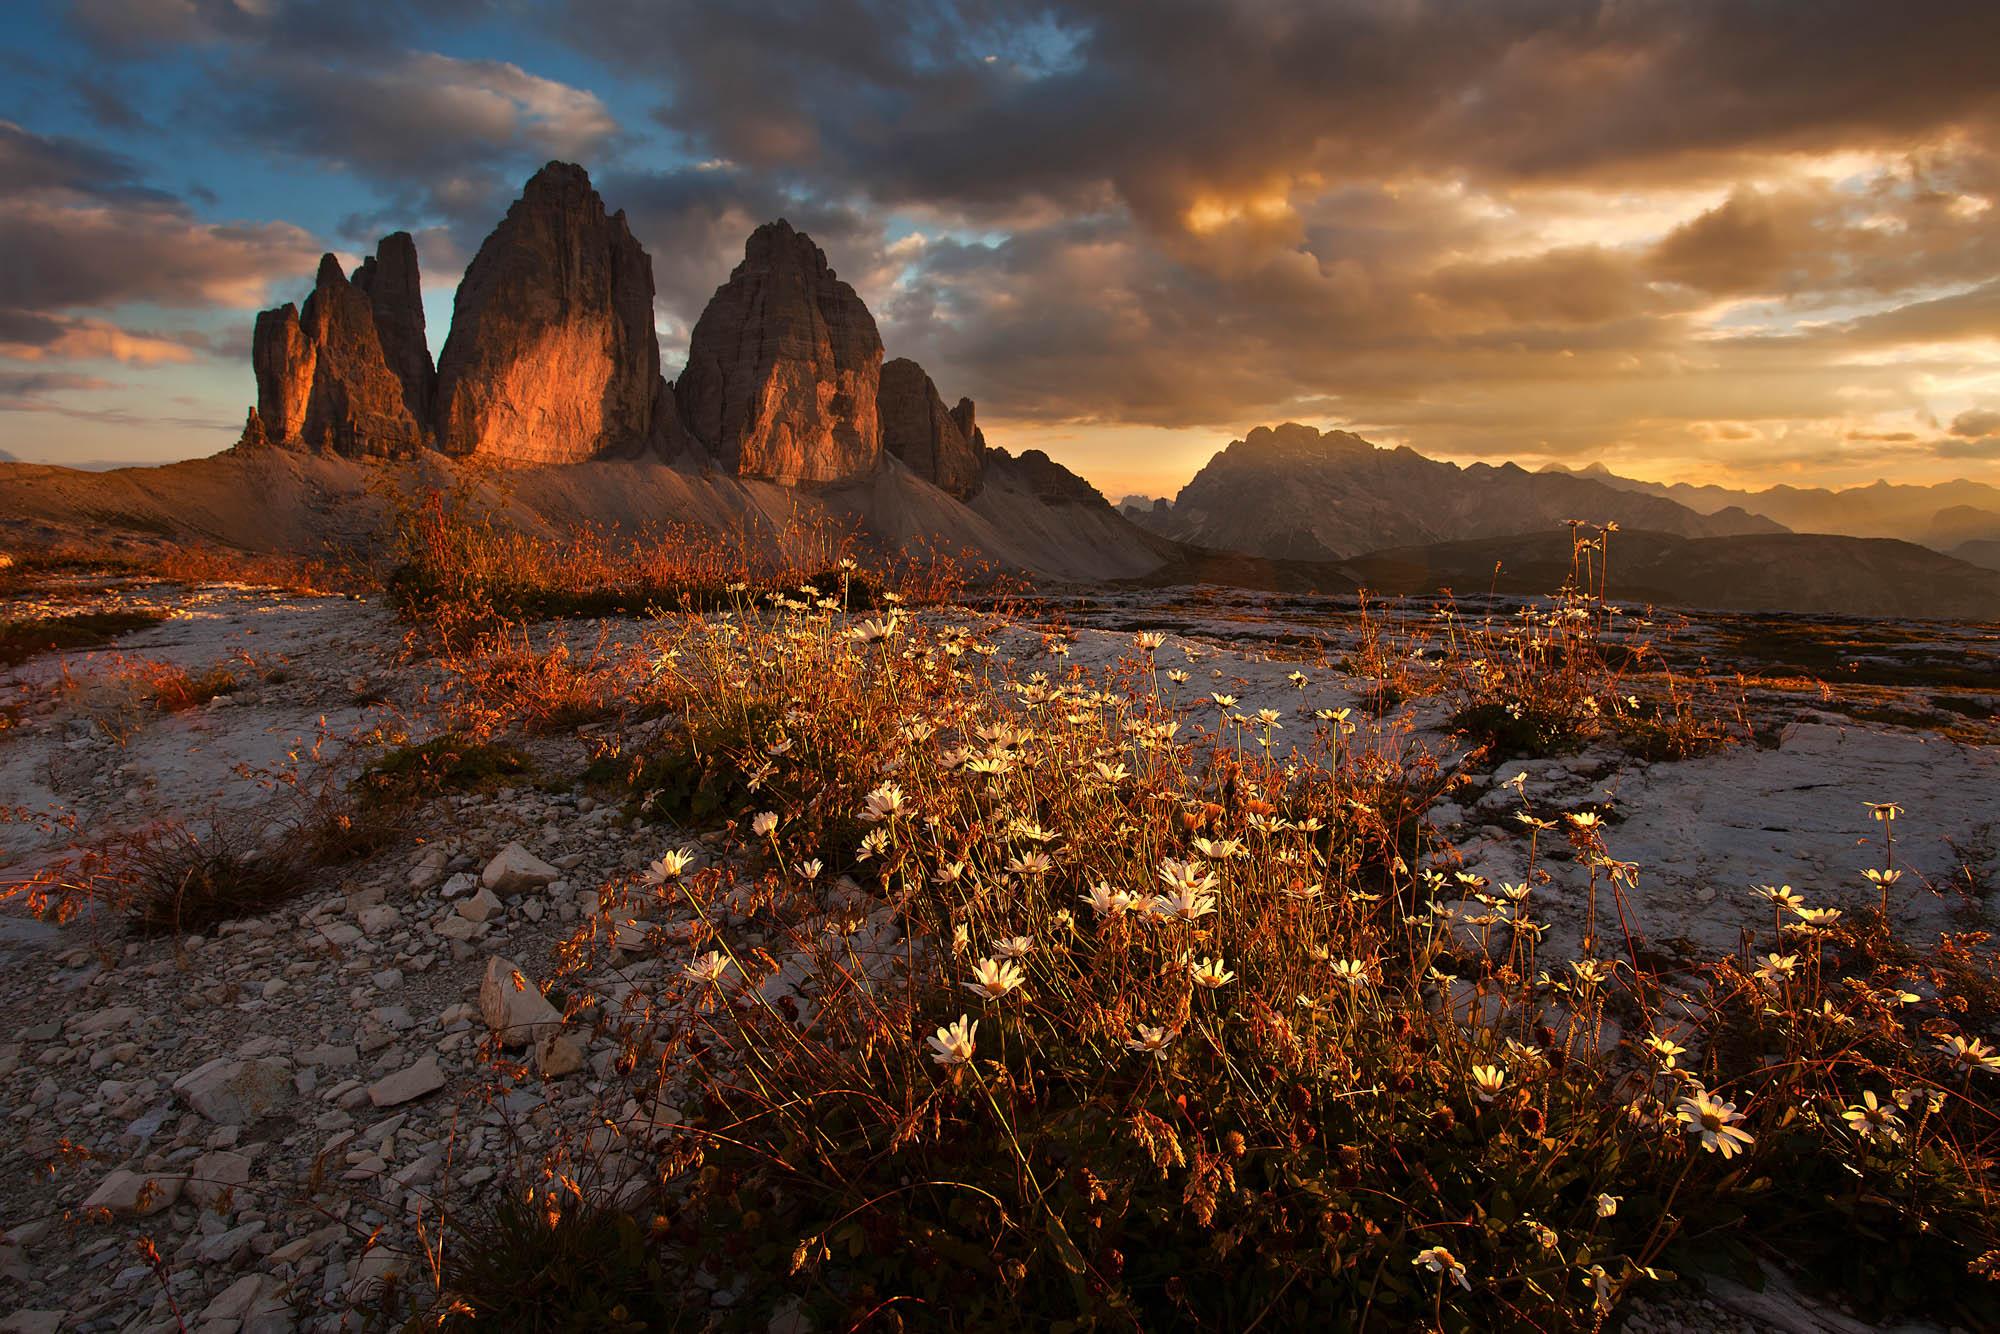 Sunset at the three monoliths. Eastern Dolomites-Italian Alps.